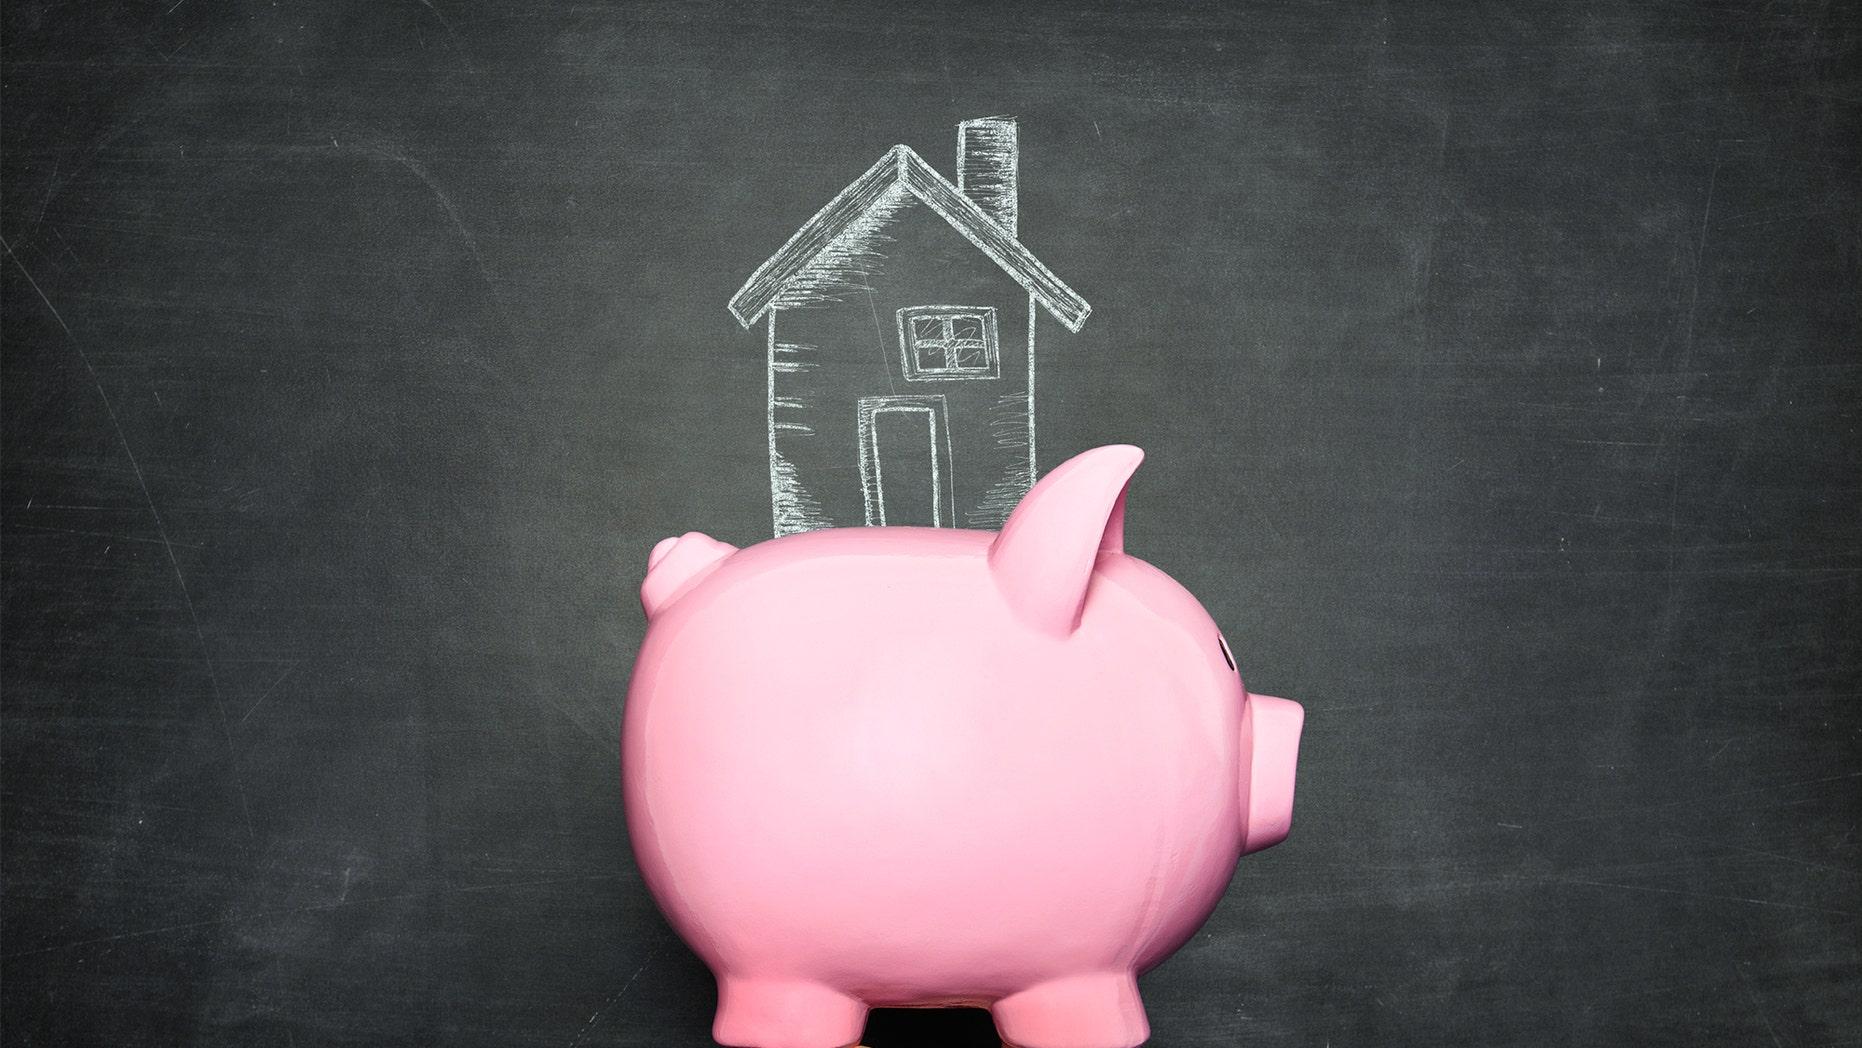 piggy-bank-house-chalk